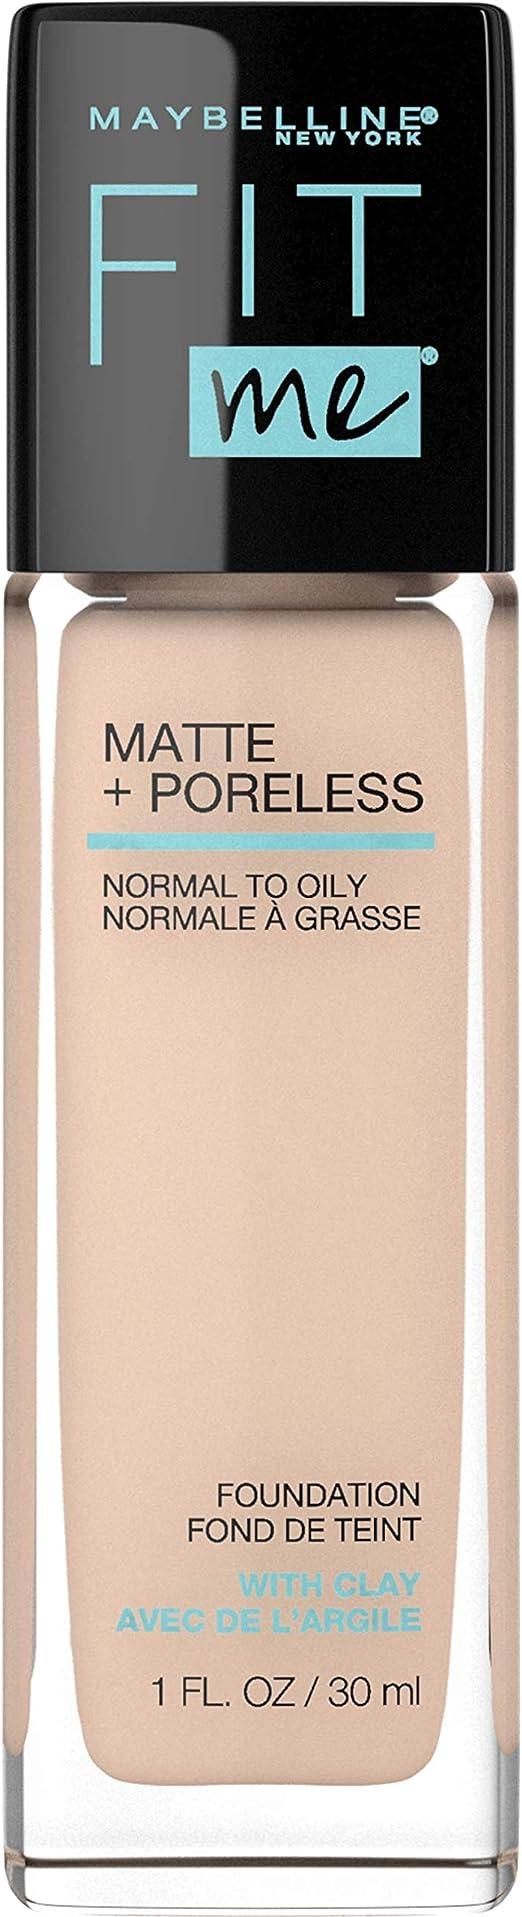 Maybelline Base de Maquillaje Fit Me Matte, 120 Classic Ivory: Amazon.com.mx: Salud y Cuidado Personal